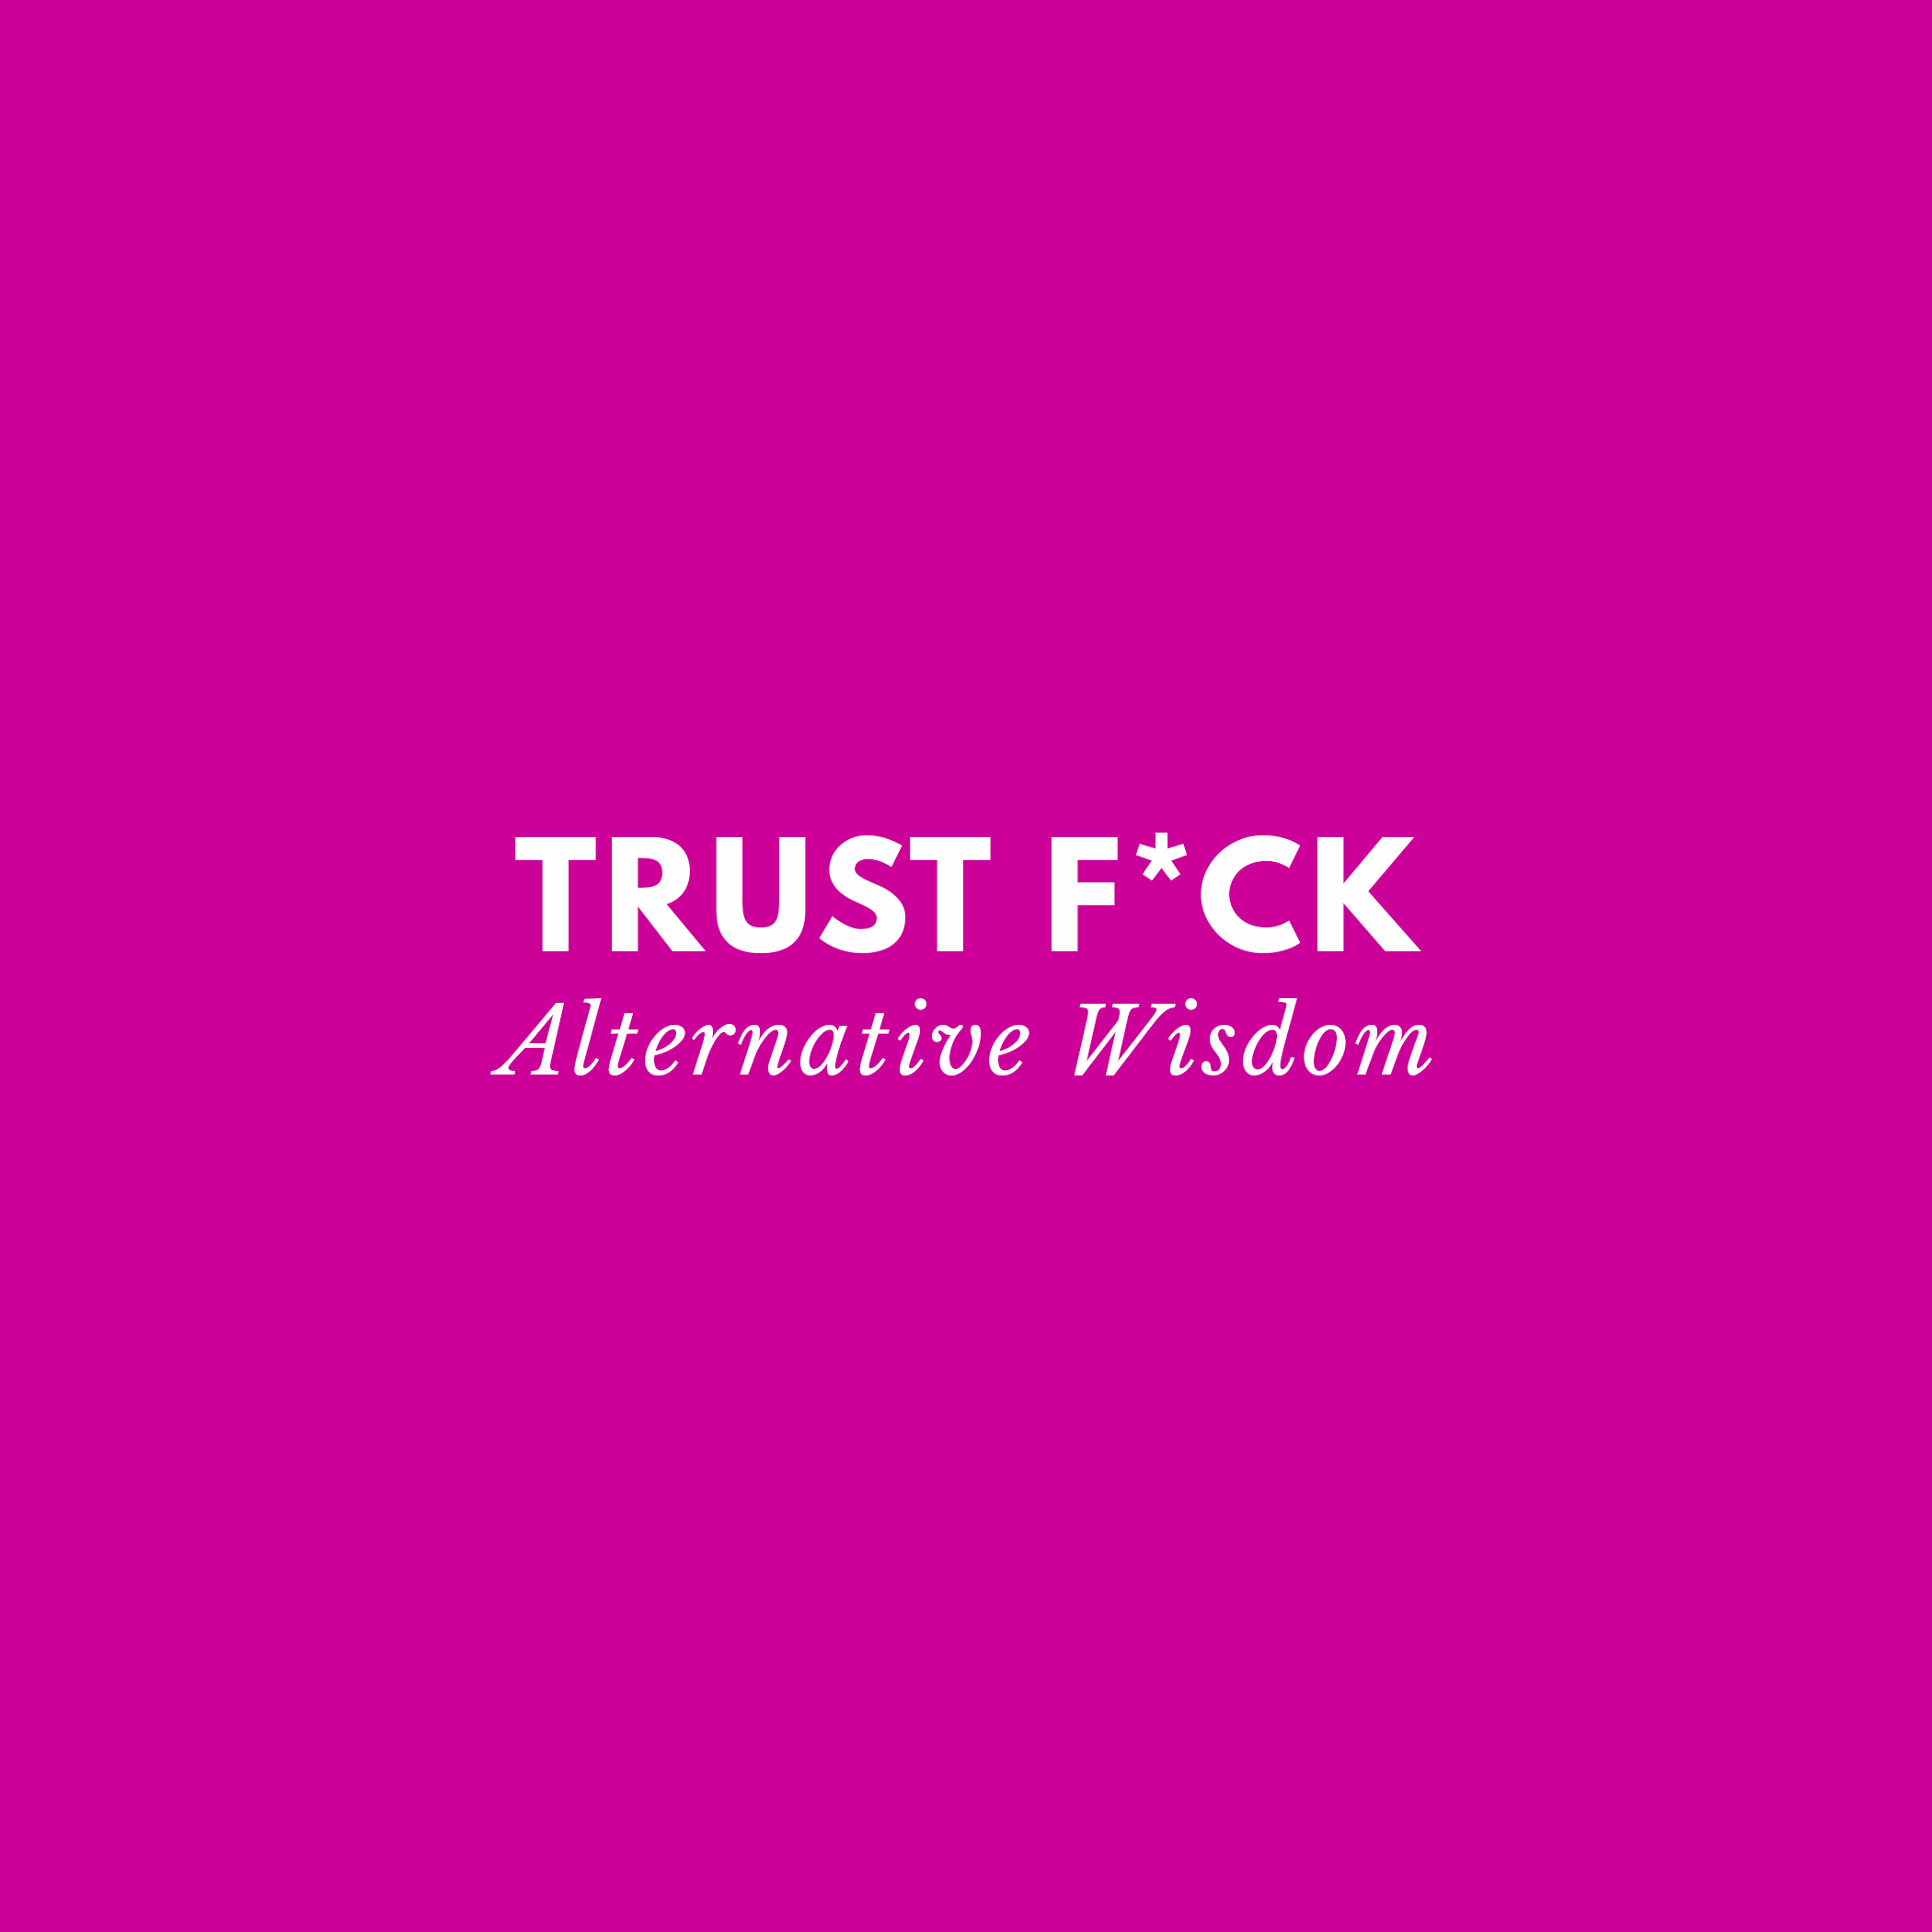 Trust-Fck-Title.jpg